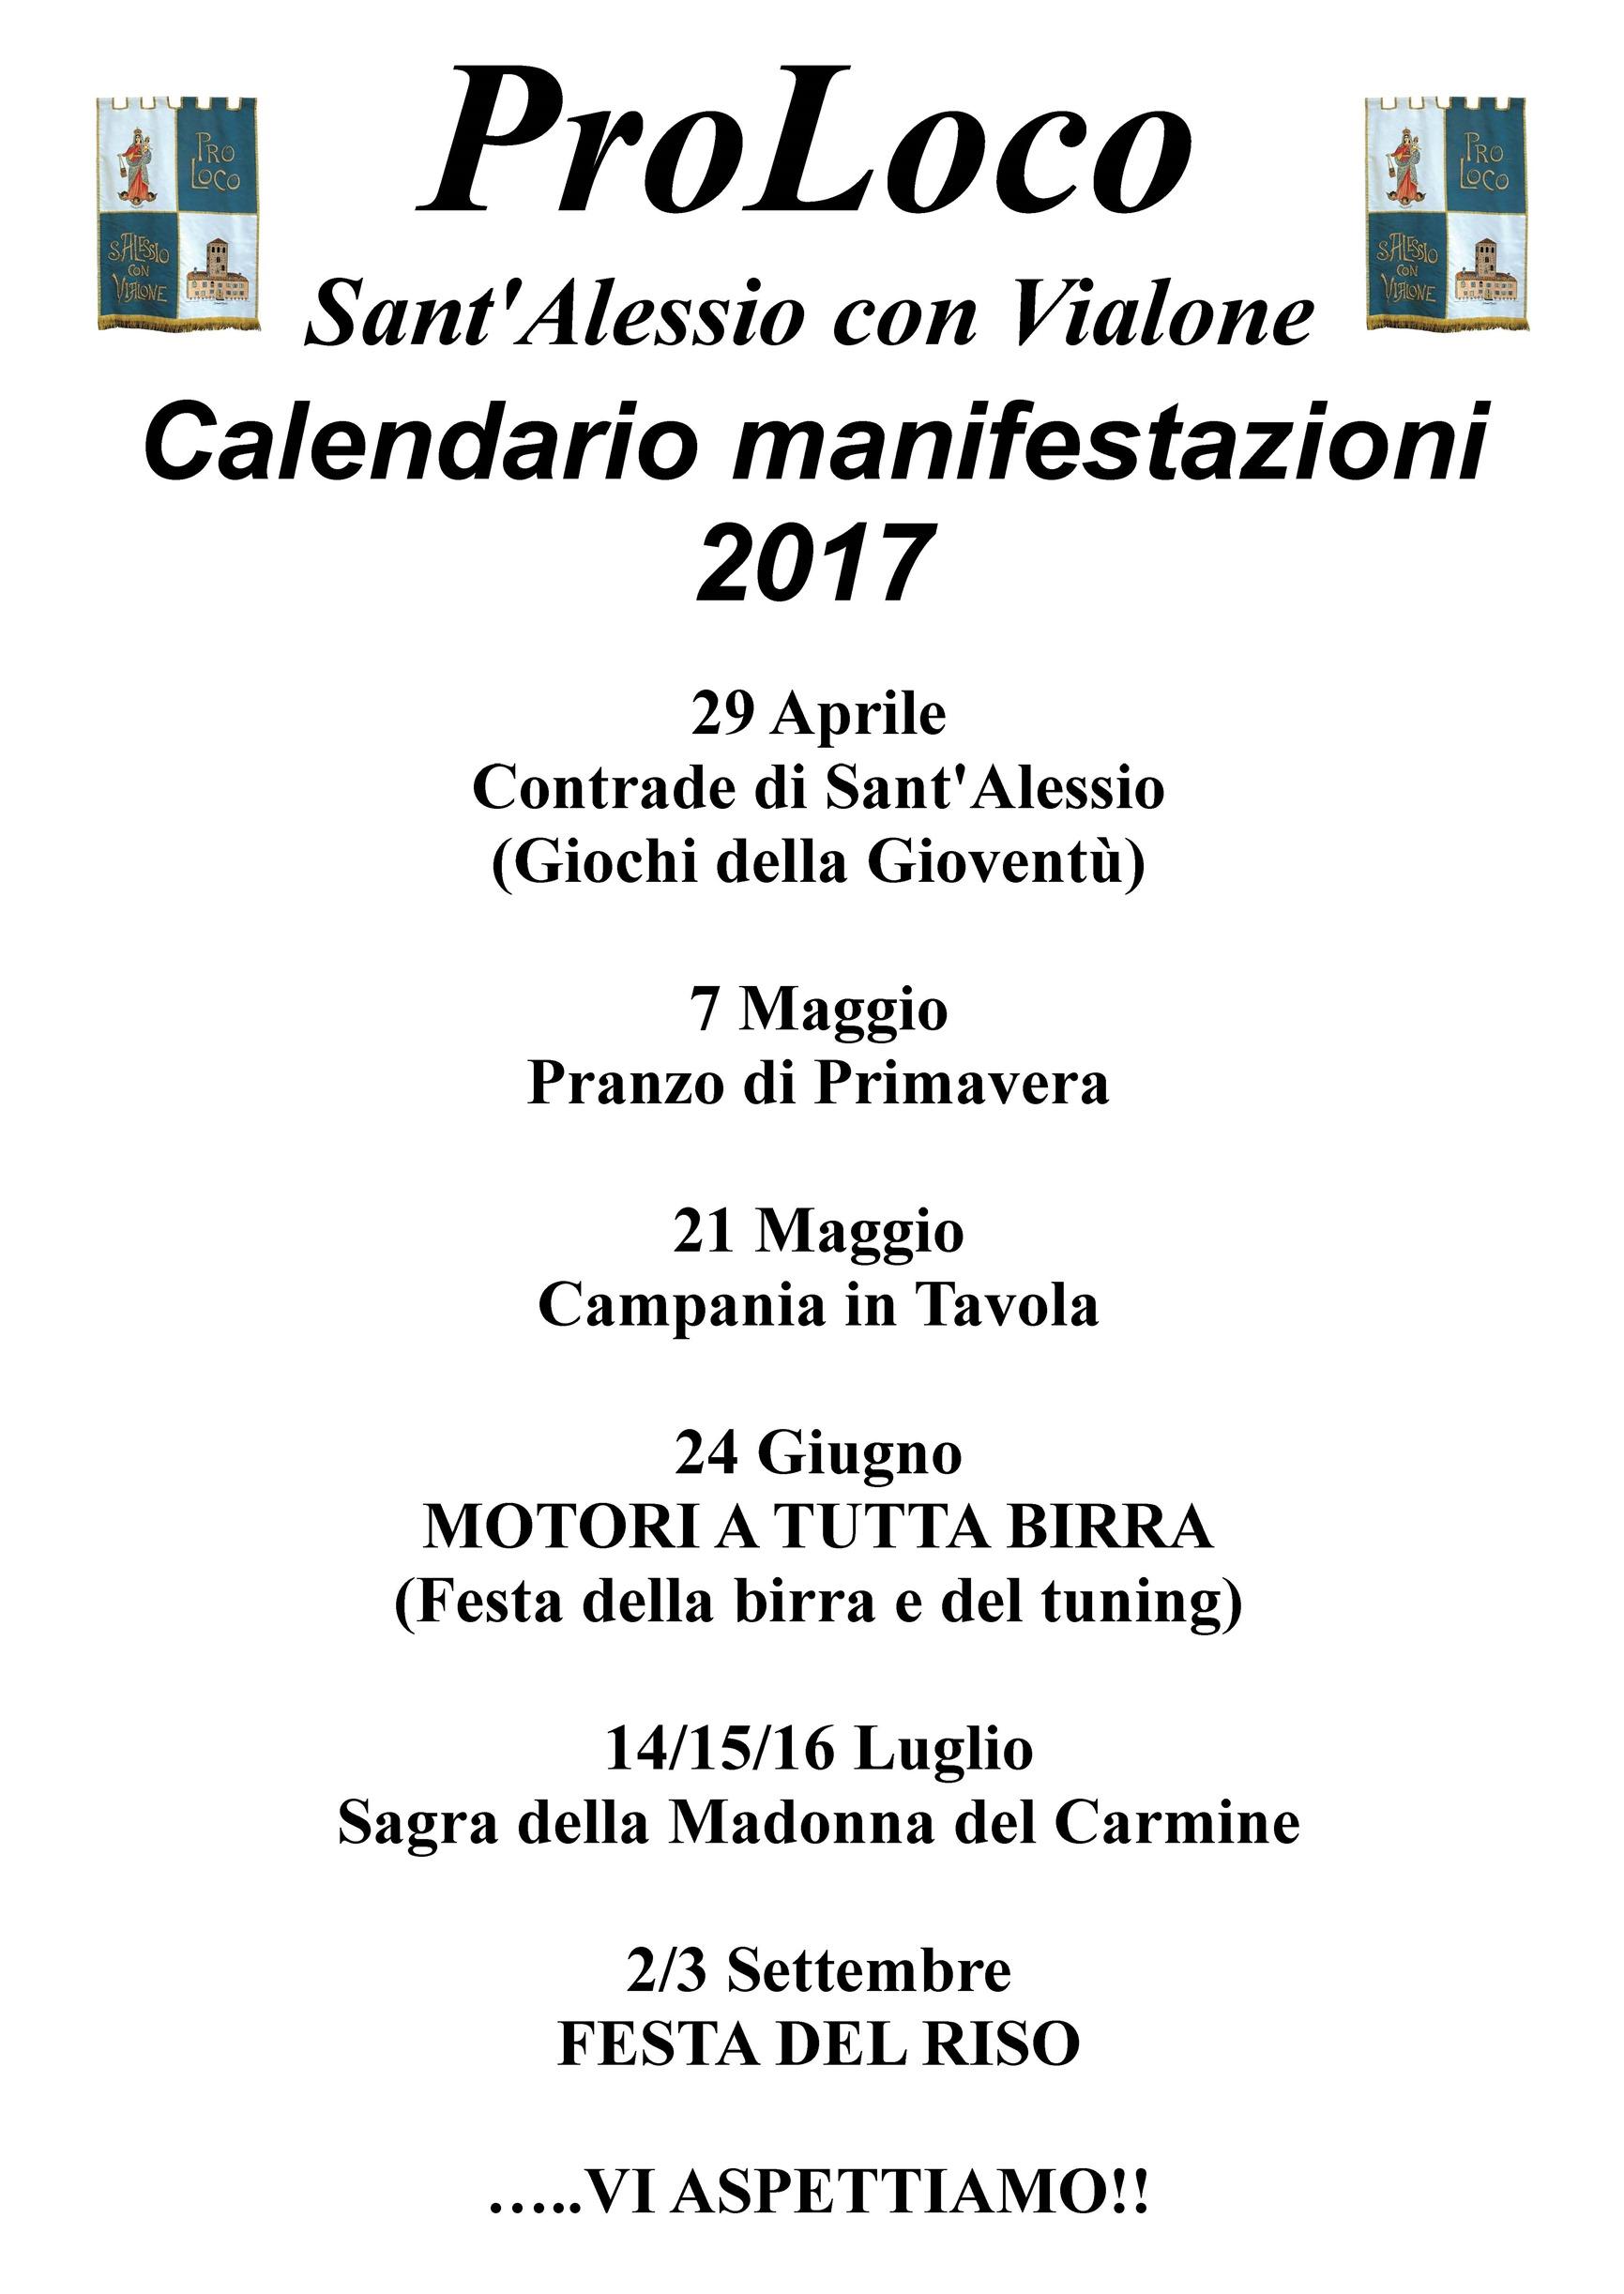 Calendario eventi 2017